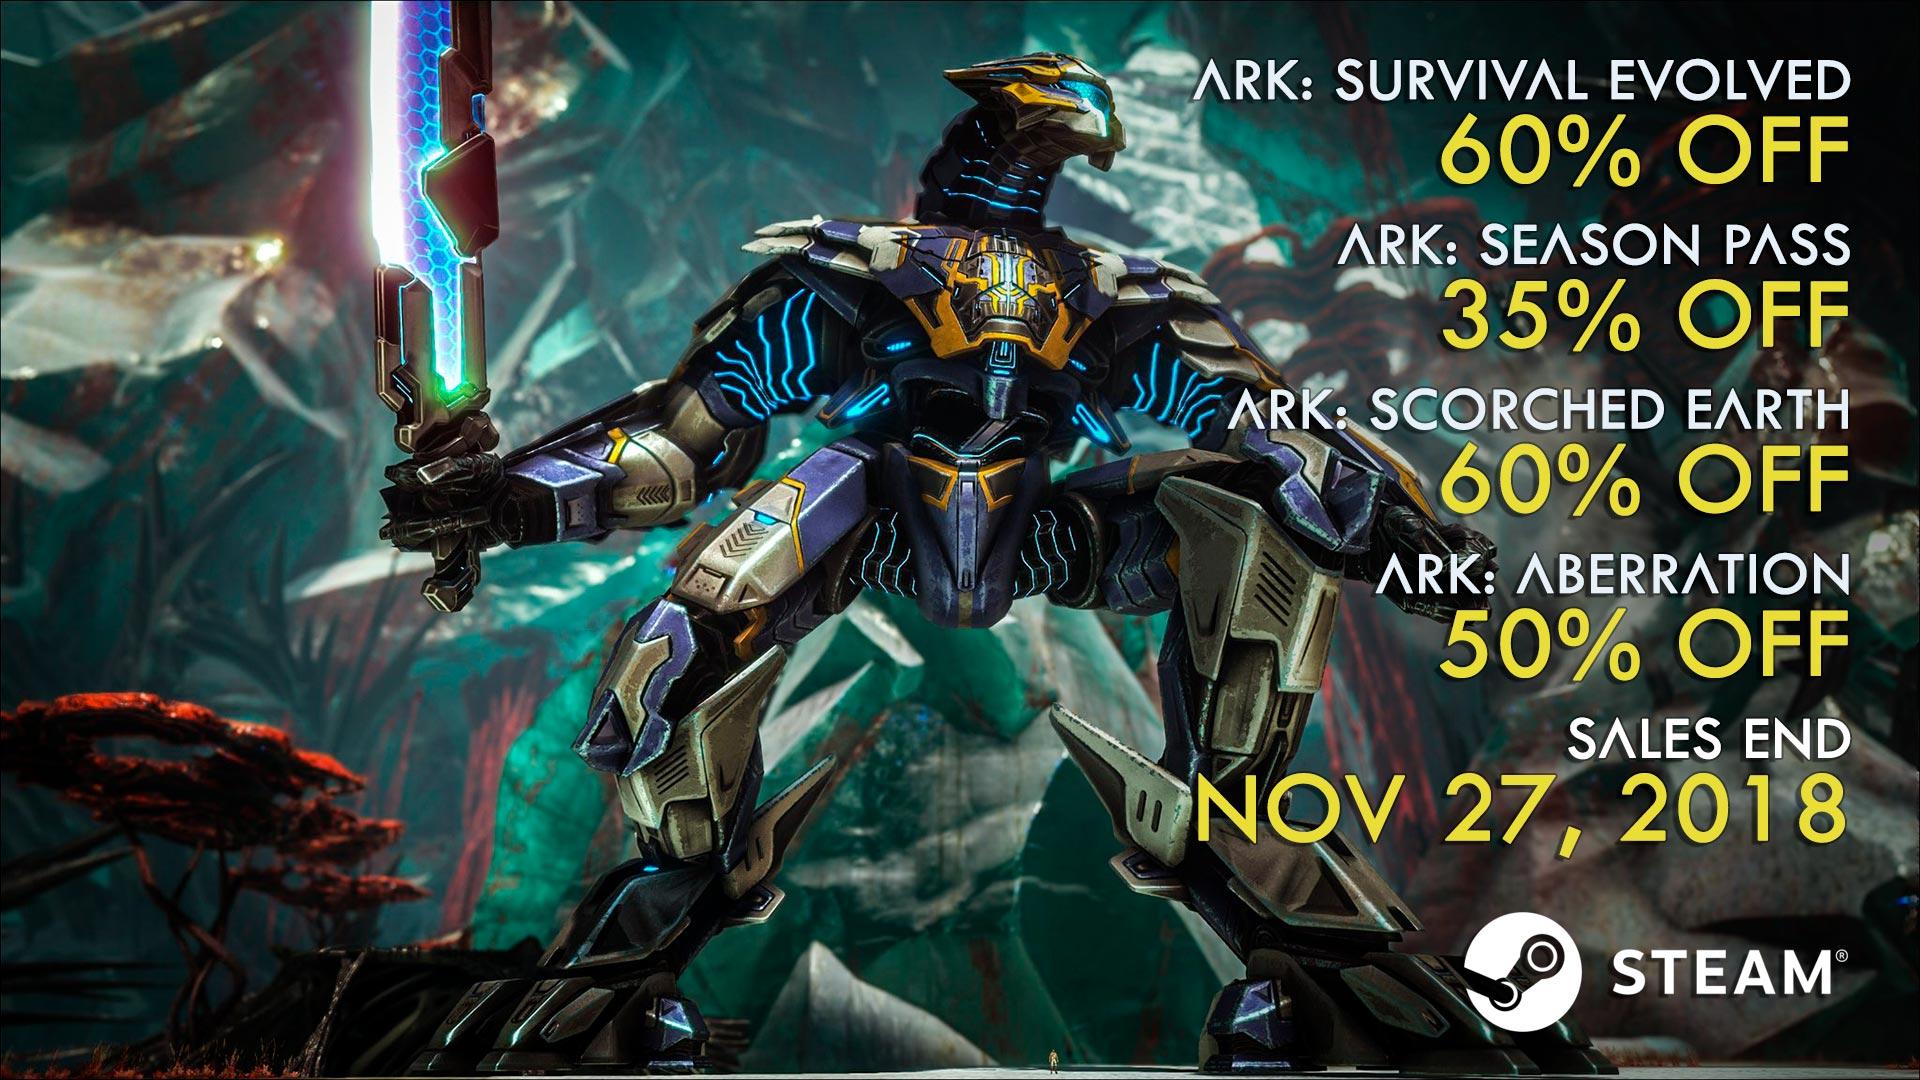 Nov 15, 2018 Wot I Think Ark: Extinction ARK: Survival Evolved